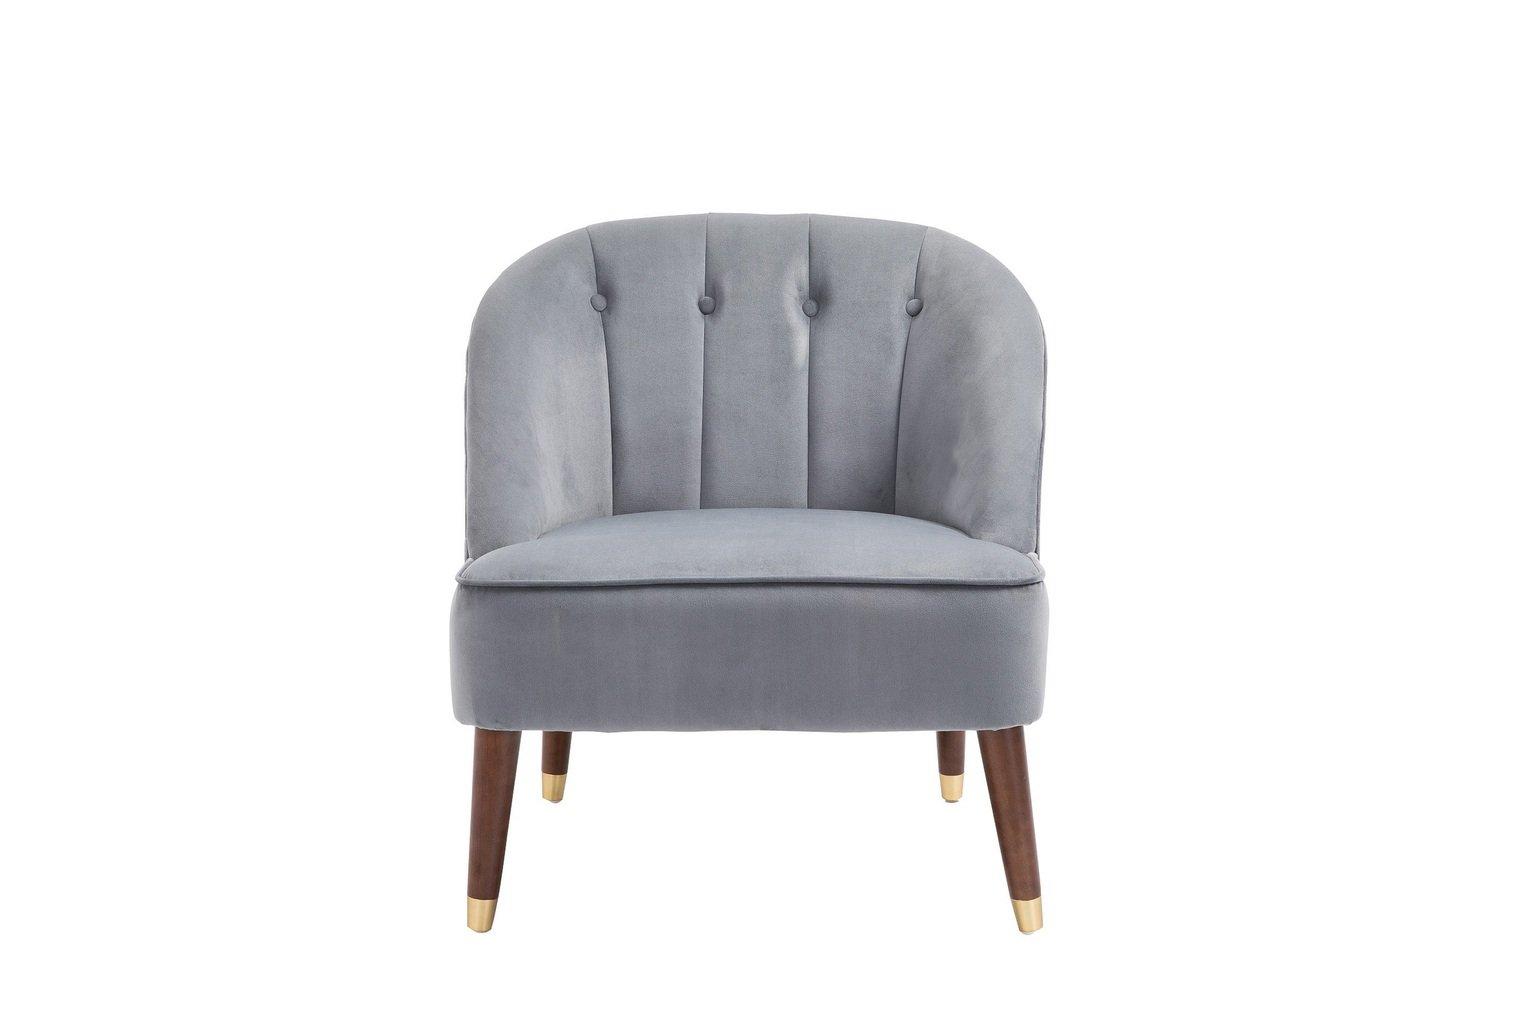 Birlea Alexa Fabric Accent Chair - Grey